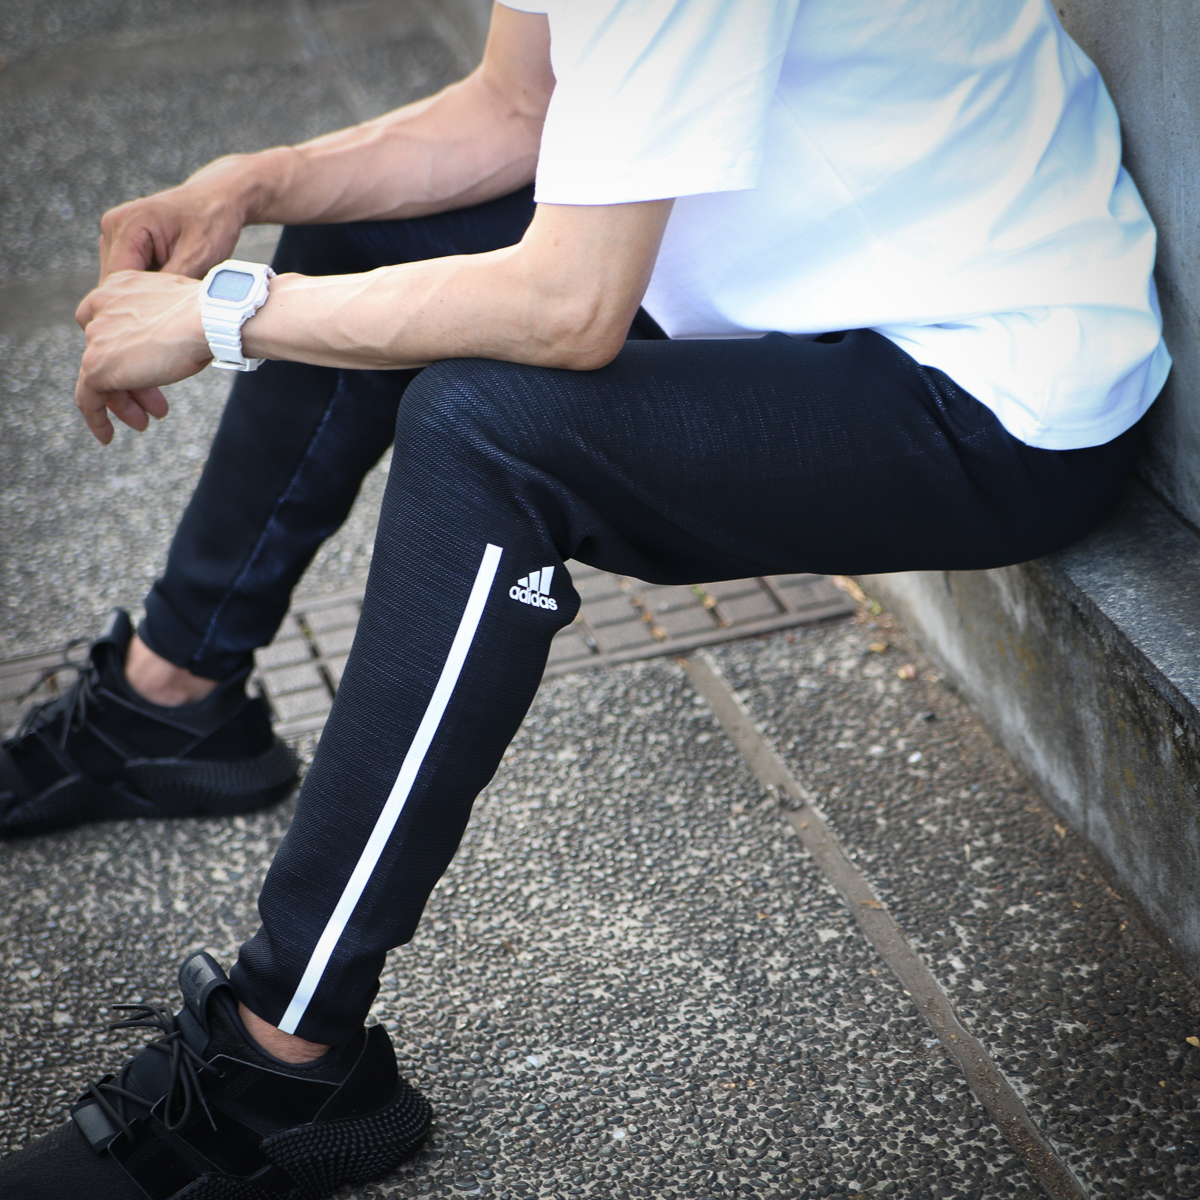 adidas M adidas Z.N.E. Parley PANTS(アディダス ゼットエヌイーパーレィフーディ-)BLACK【メンズ パーカー】18FW-I